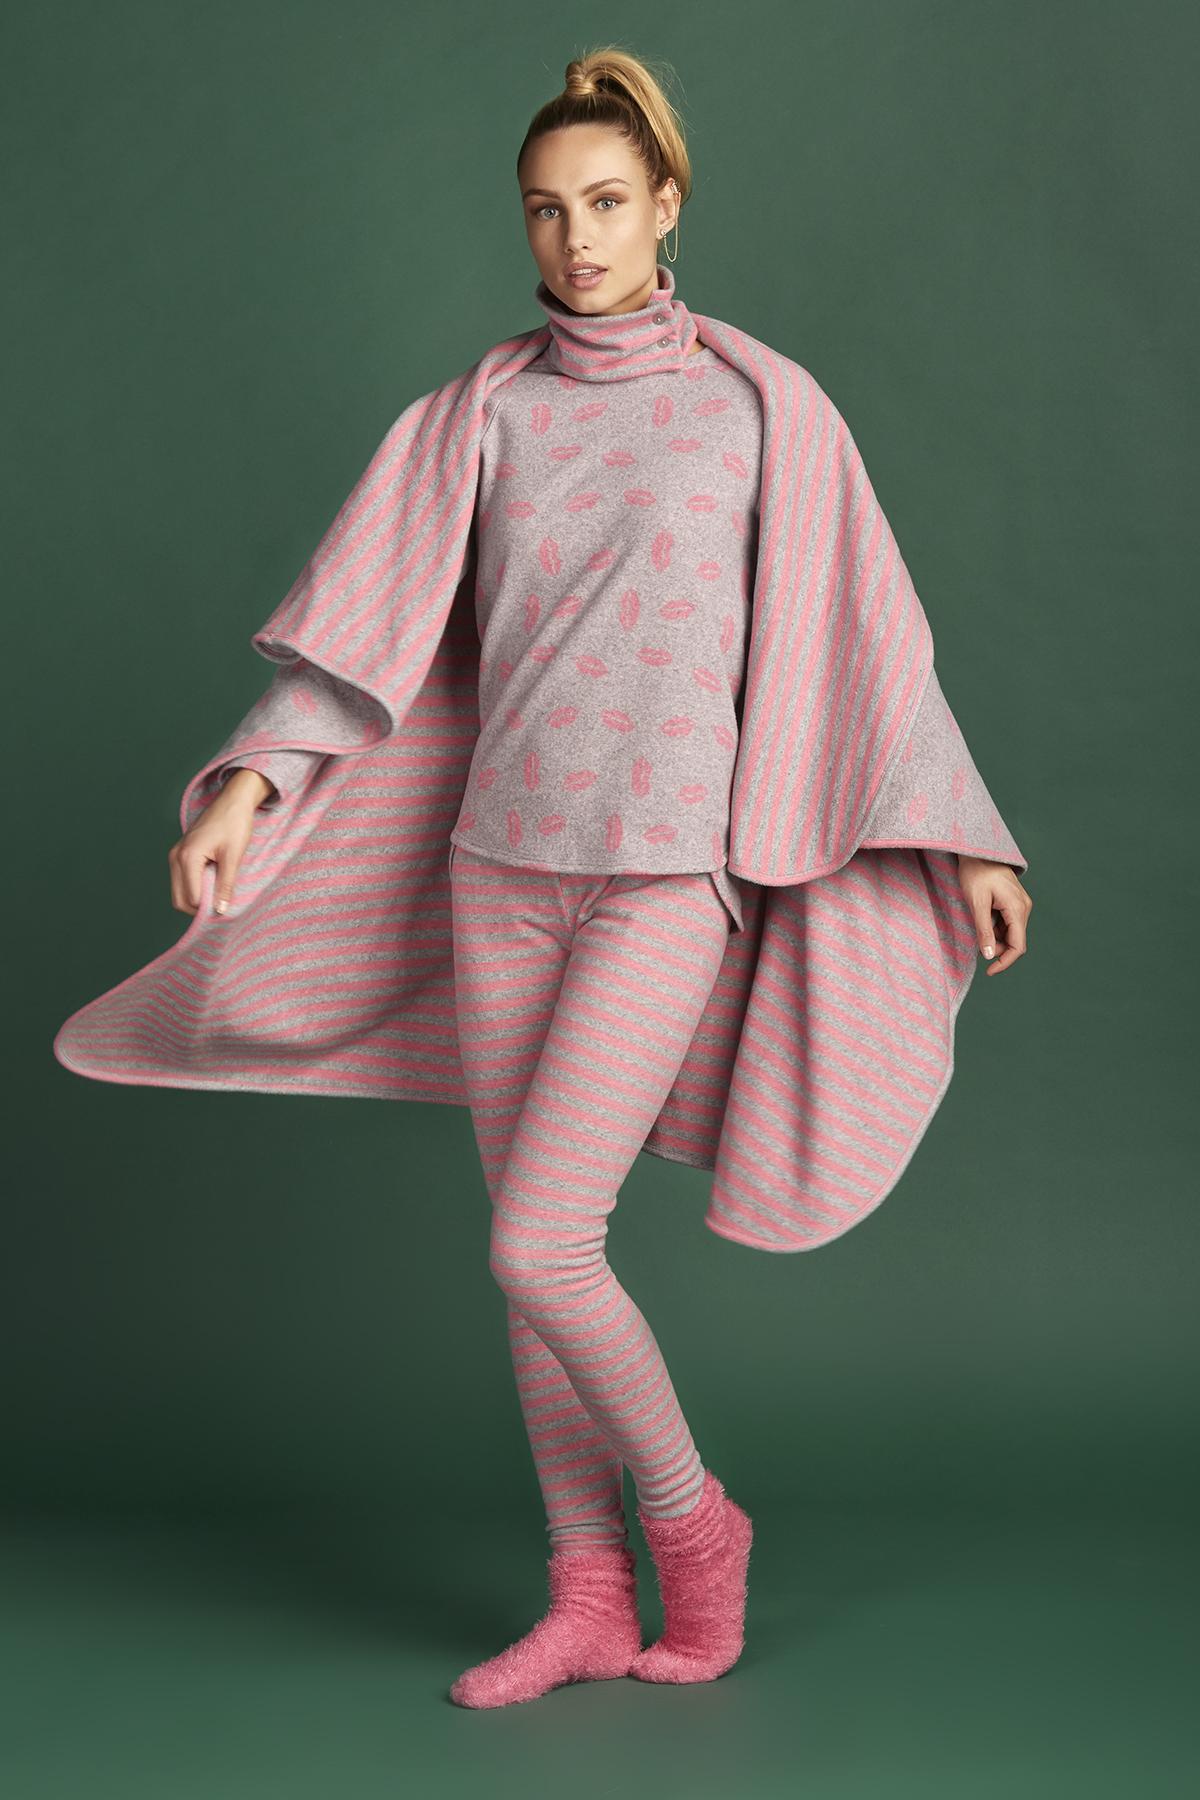 5870dc6aa98 Γυναικεία πυτζάμα χειμωνιάτικη Ροζ με Γρι 3 κομμάτια Andra lingerie made in  Italy μόνο στο BUSTO